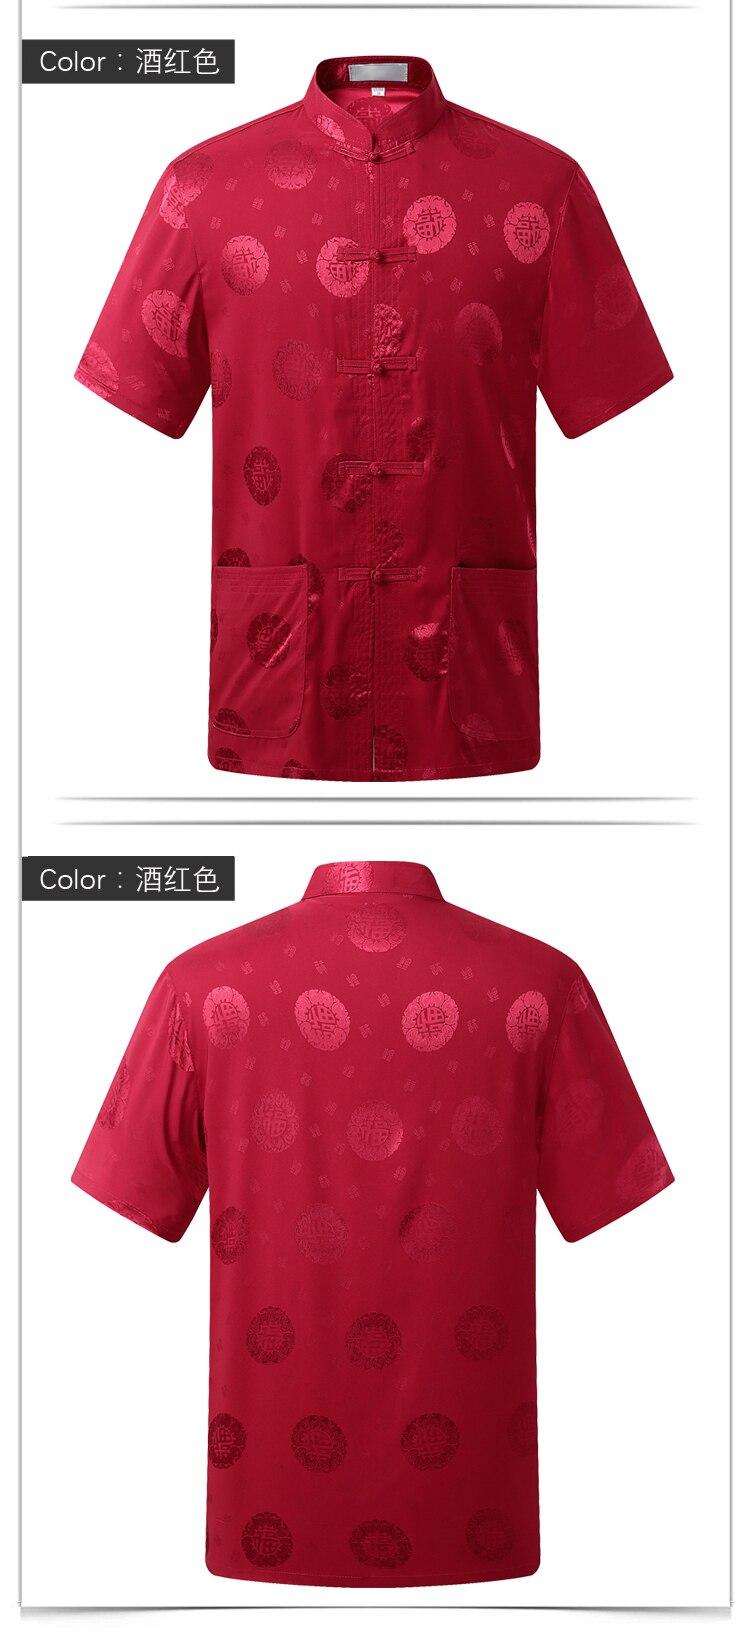 WAEOLSA Men Oriental 2PCS Pant Set Mulberry Silk Top And Pant Suit Male Summer Tangzhuang Tweinset Red Beige Blue Suits (4)